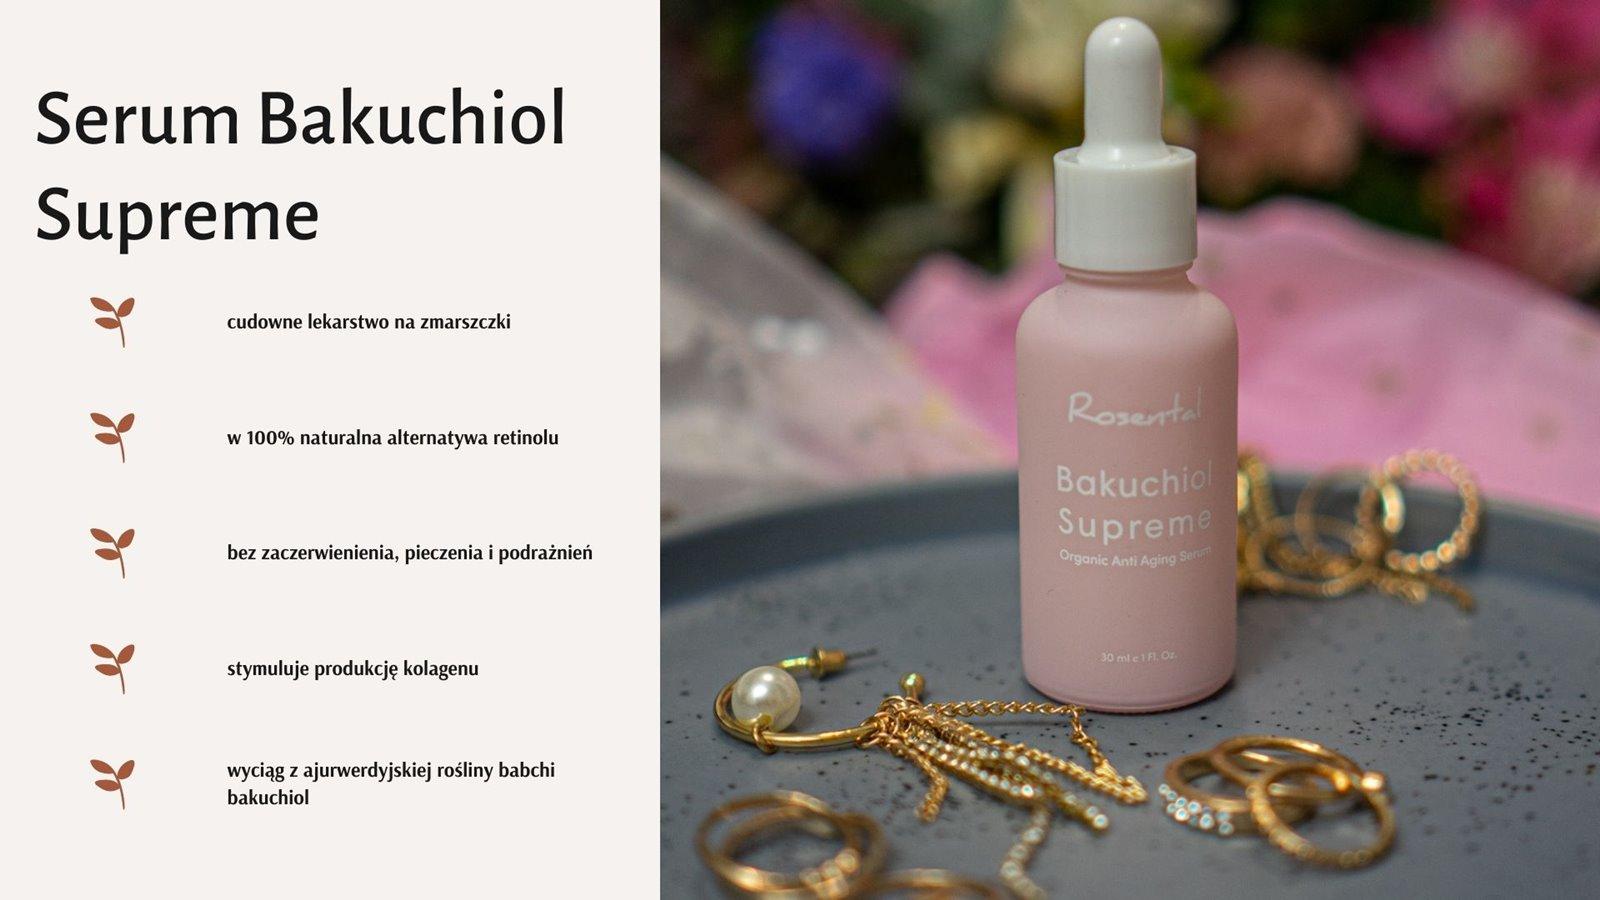 3 Serum do twarzy bakuchiol supreme rosental organics cena opinia recenzja rabat czy warto